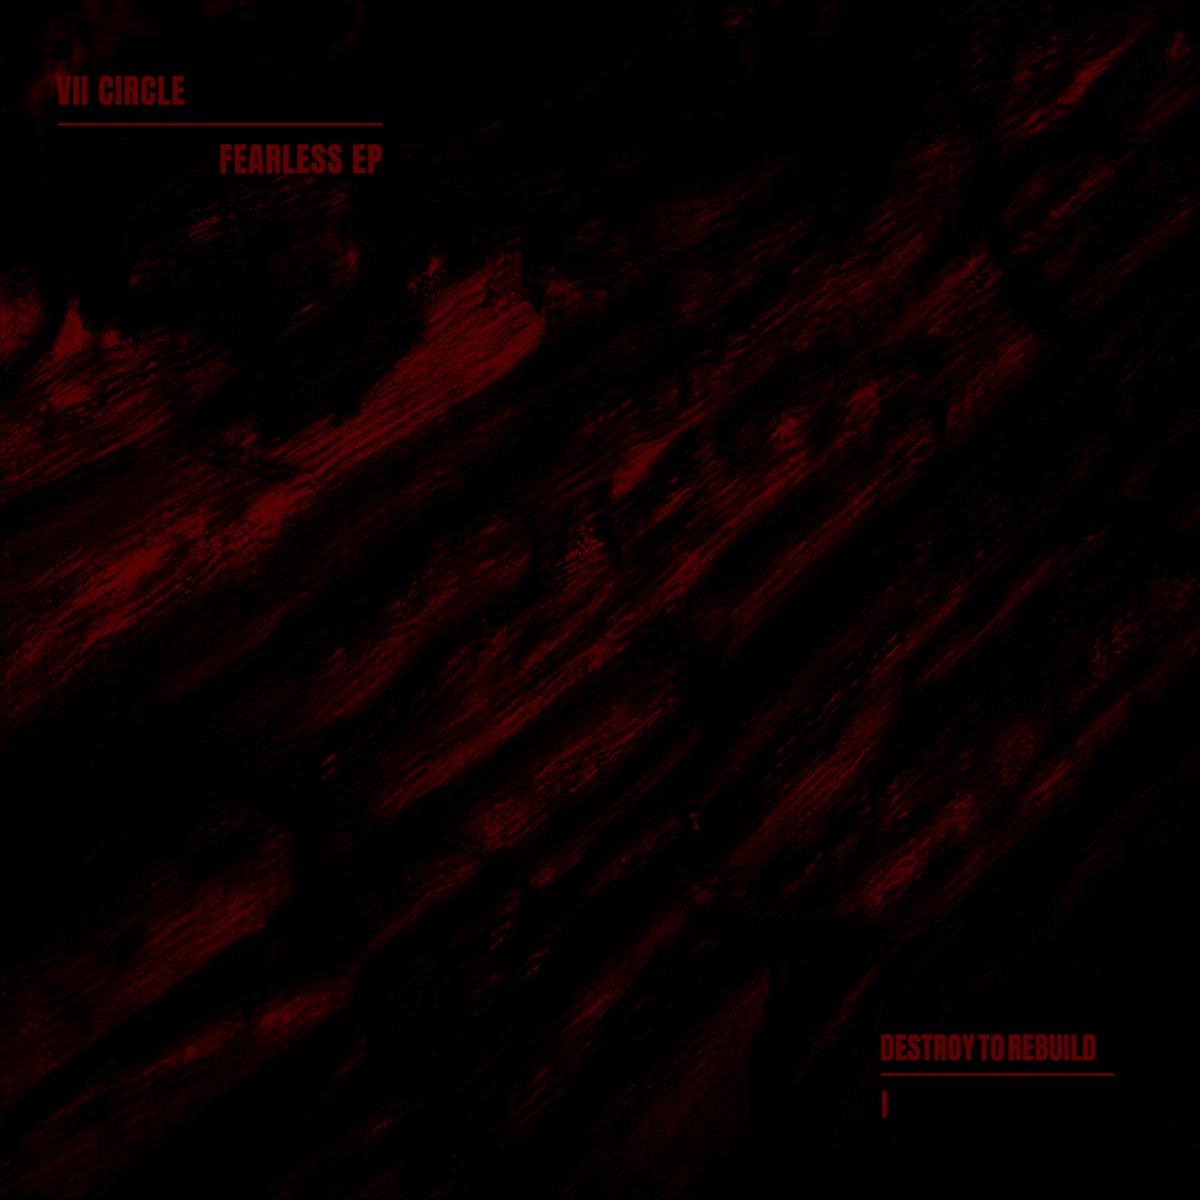 DTR001 ARTWORK VII Circle - Fearless EP - Destroy To Rebuild